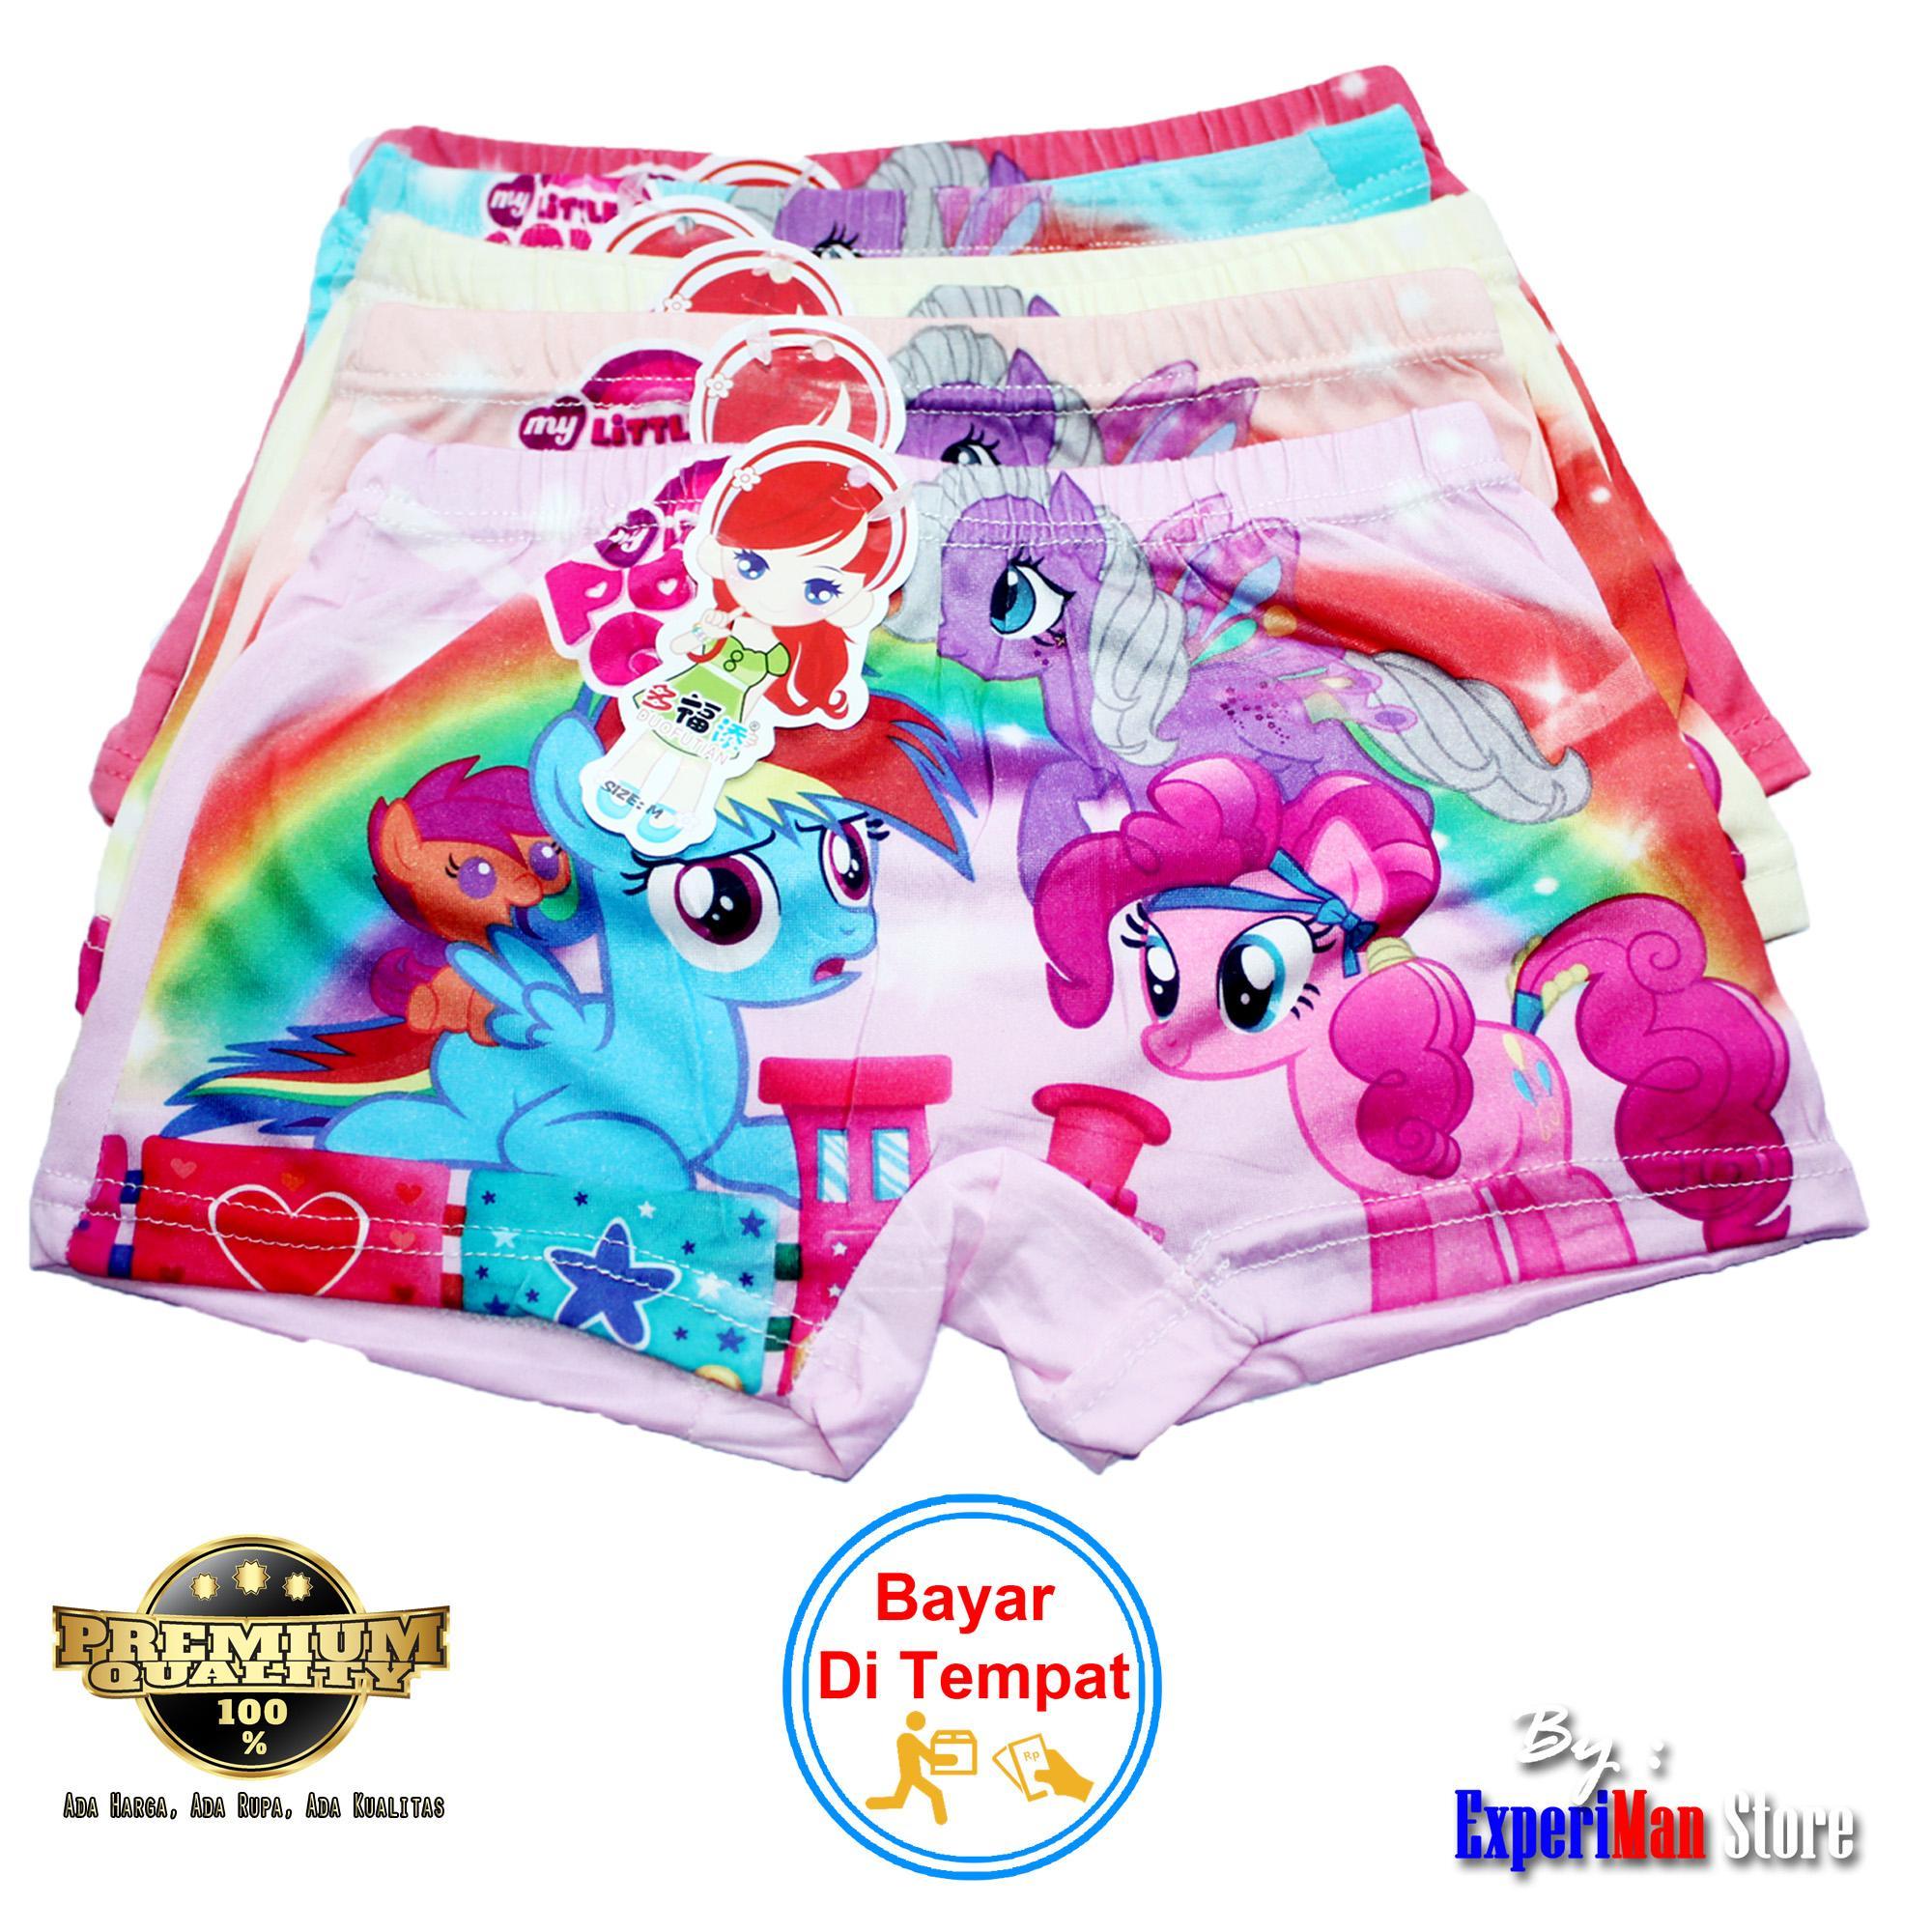 6 Pcs Celana Dalam / Boxer Anak Perempuan Motif Litle Pony